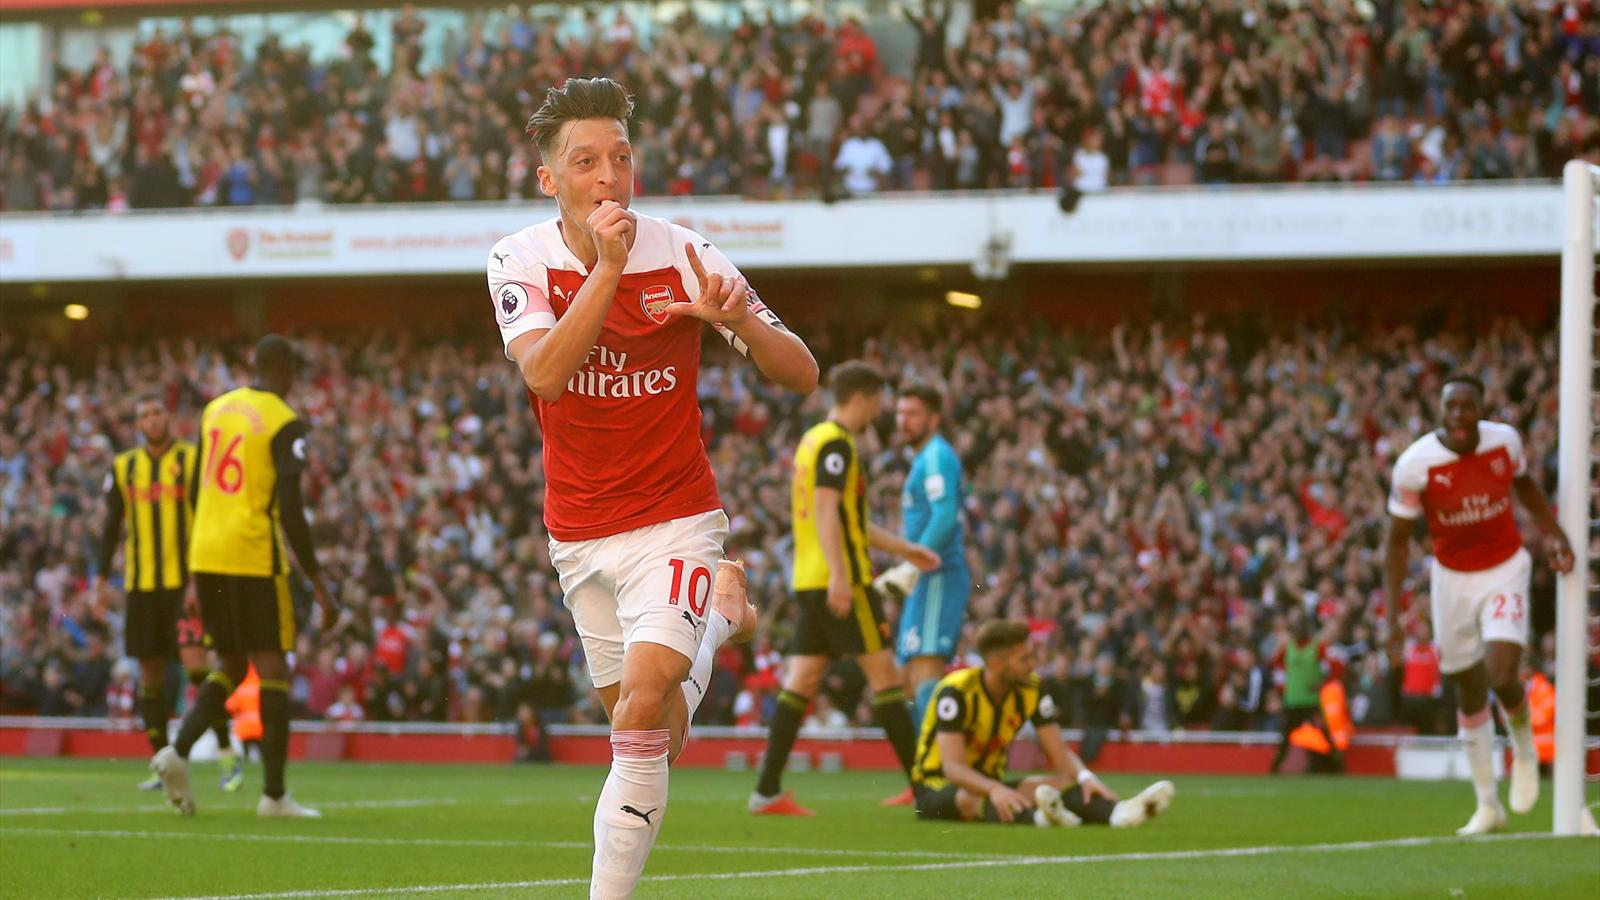 Mesut Ozil on target as Arsenal sneak past Watford - Premier League 2018-2019 - Football - Eurosport